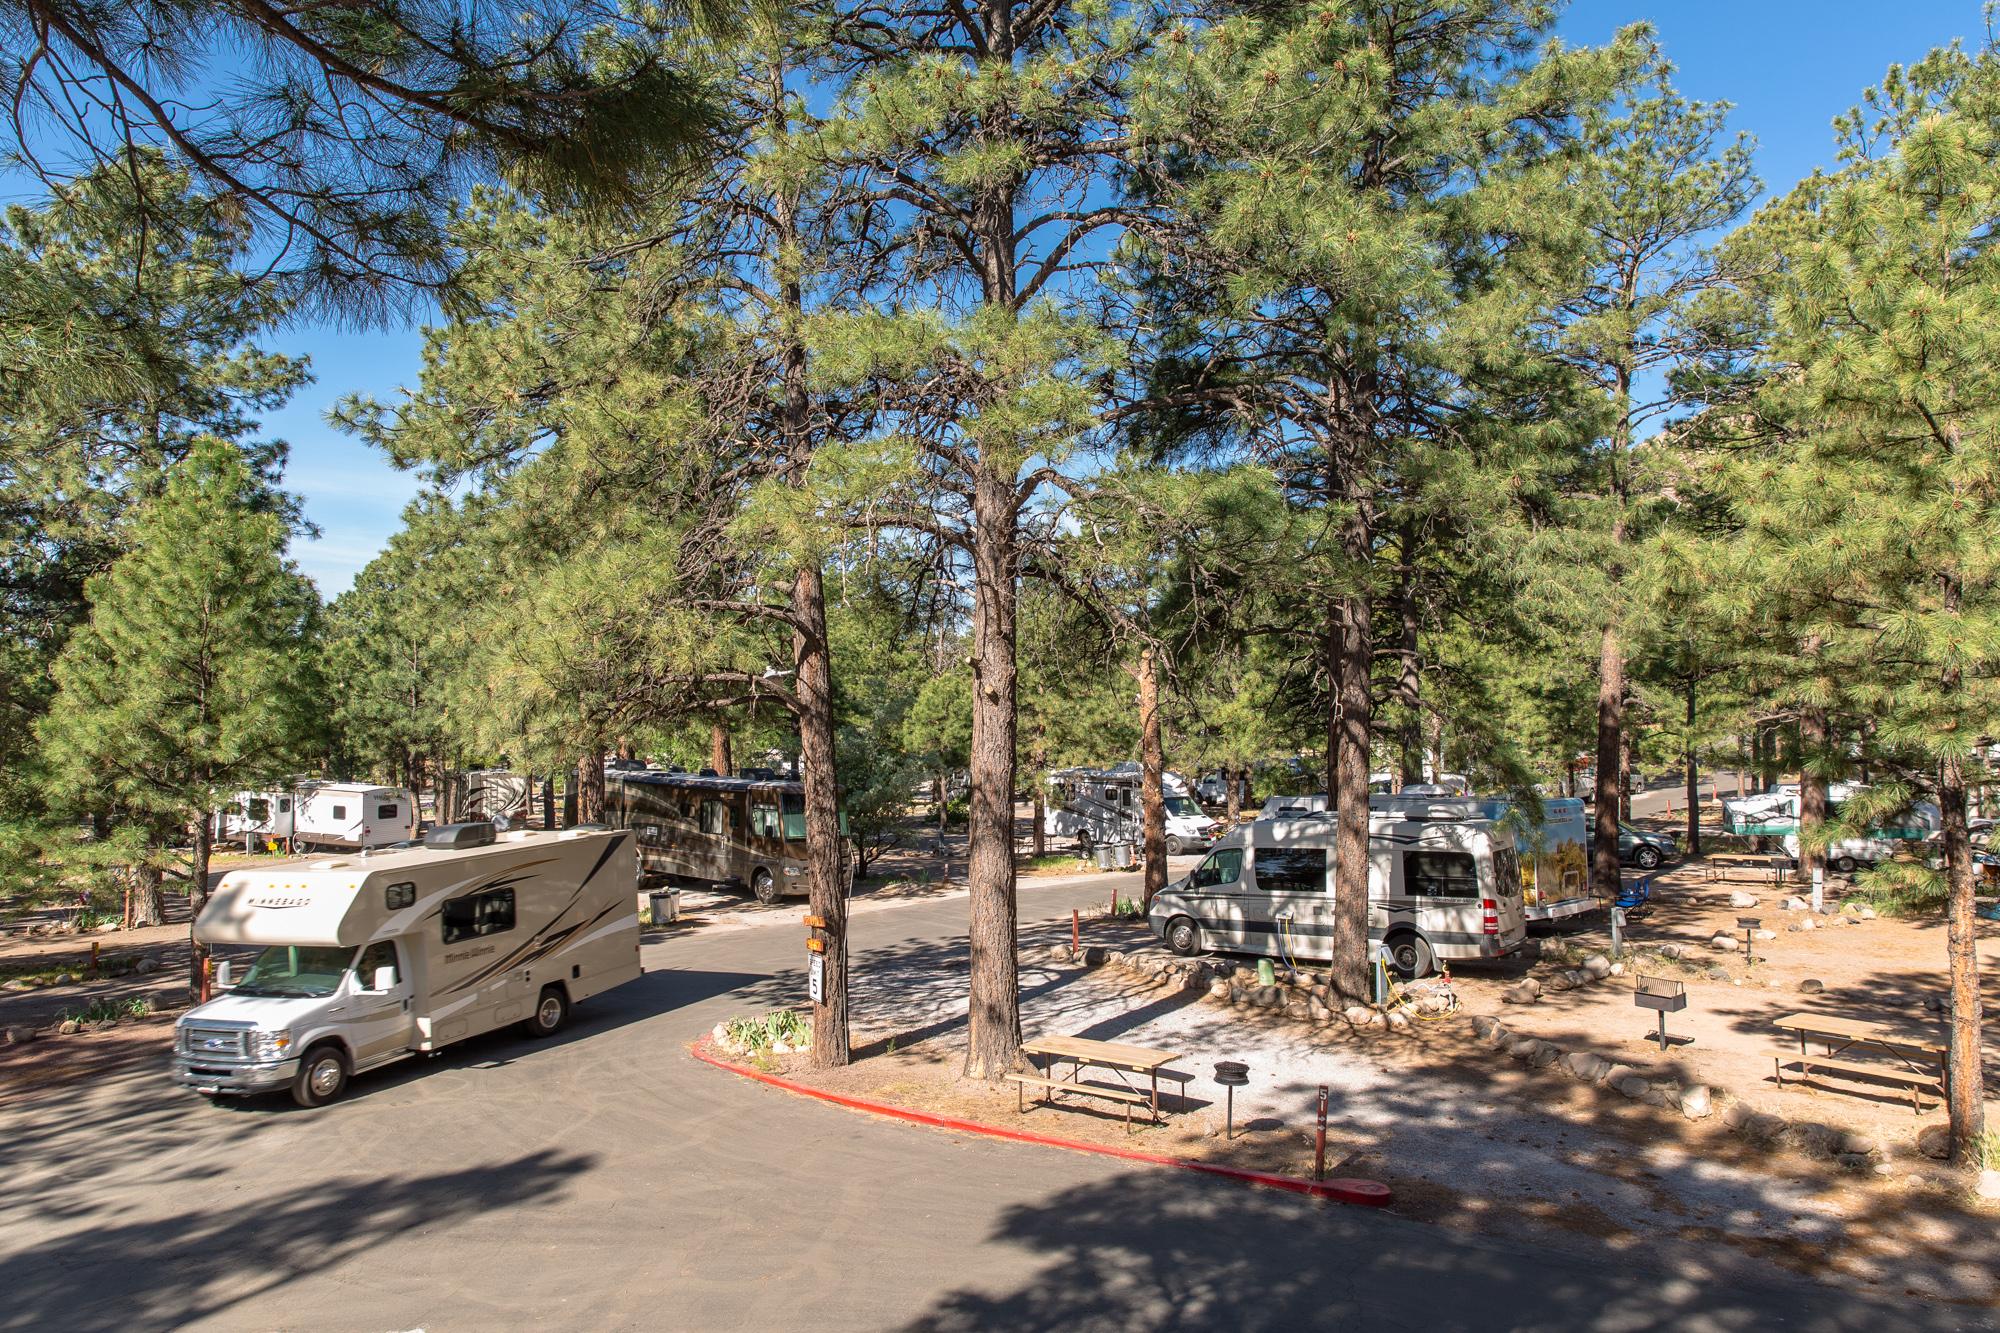 Map Of Koa Arizona.Flagstaff Arizona Rv Camping Sites Flagstaff Koa